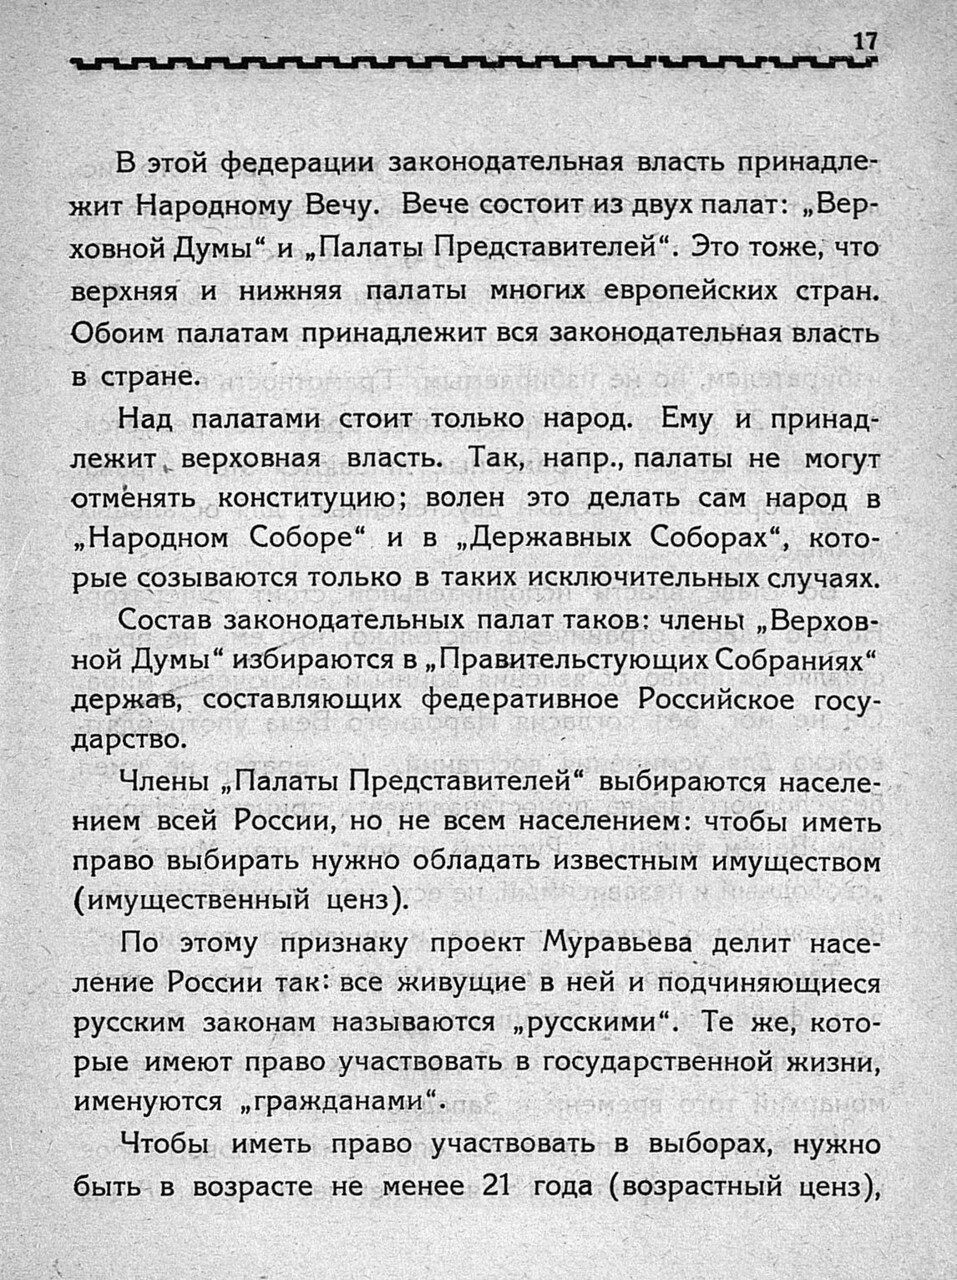 https://img-fotki.yandex.ru/get/26767/199368979.23/0_1bfad5_42536160_XXXL.jpg